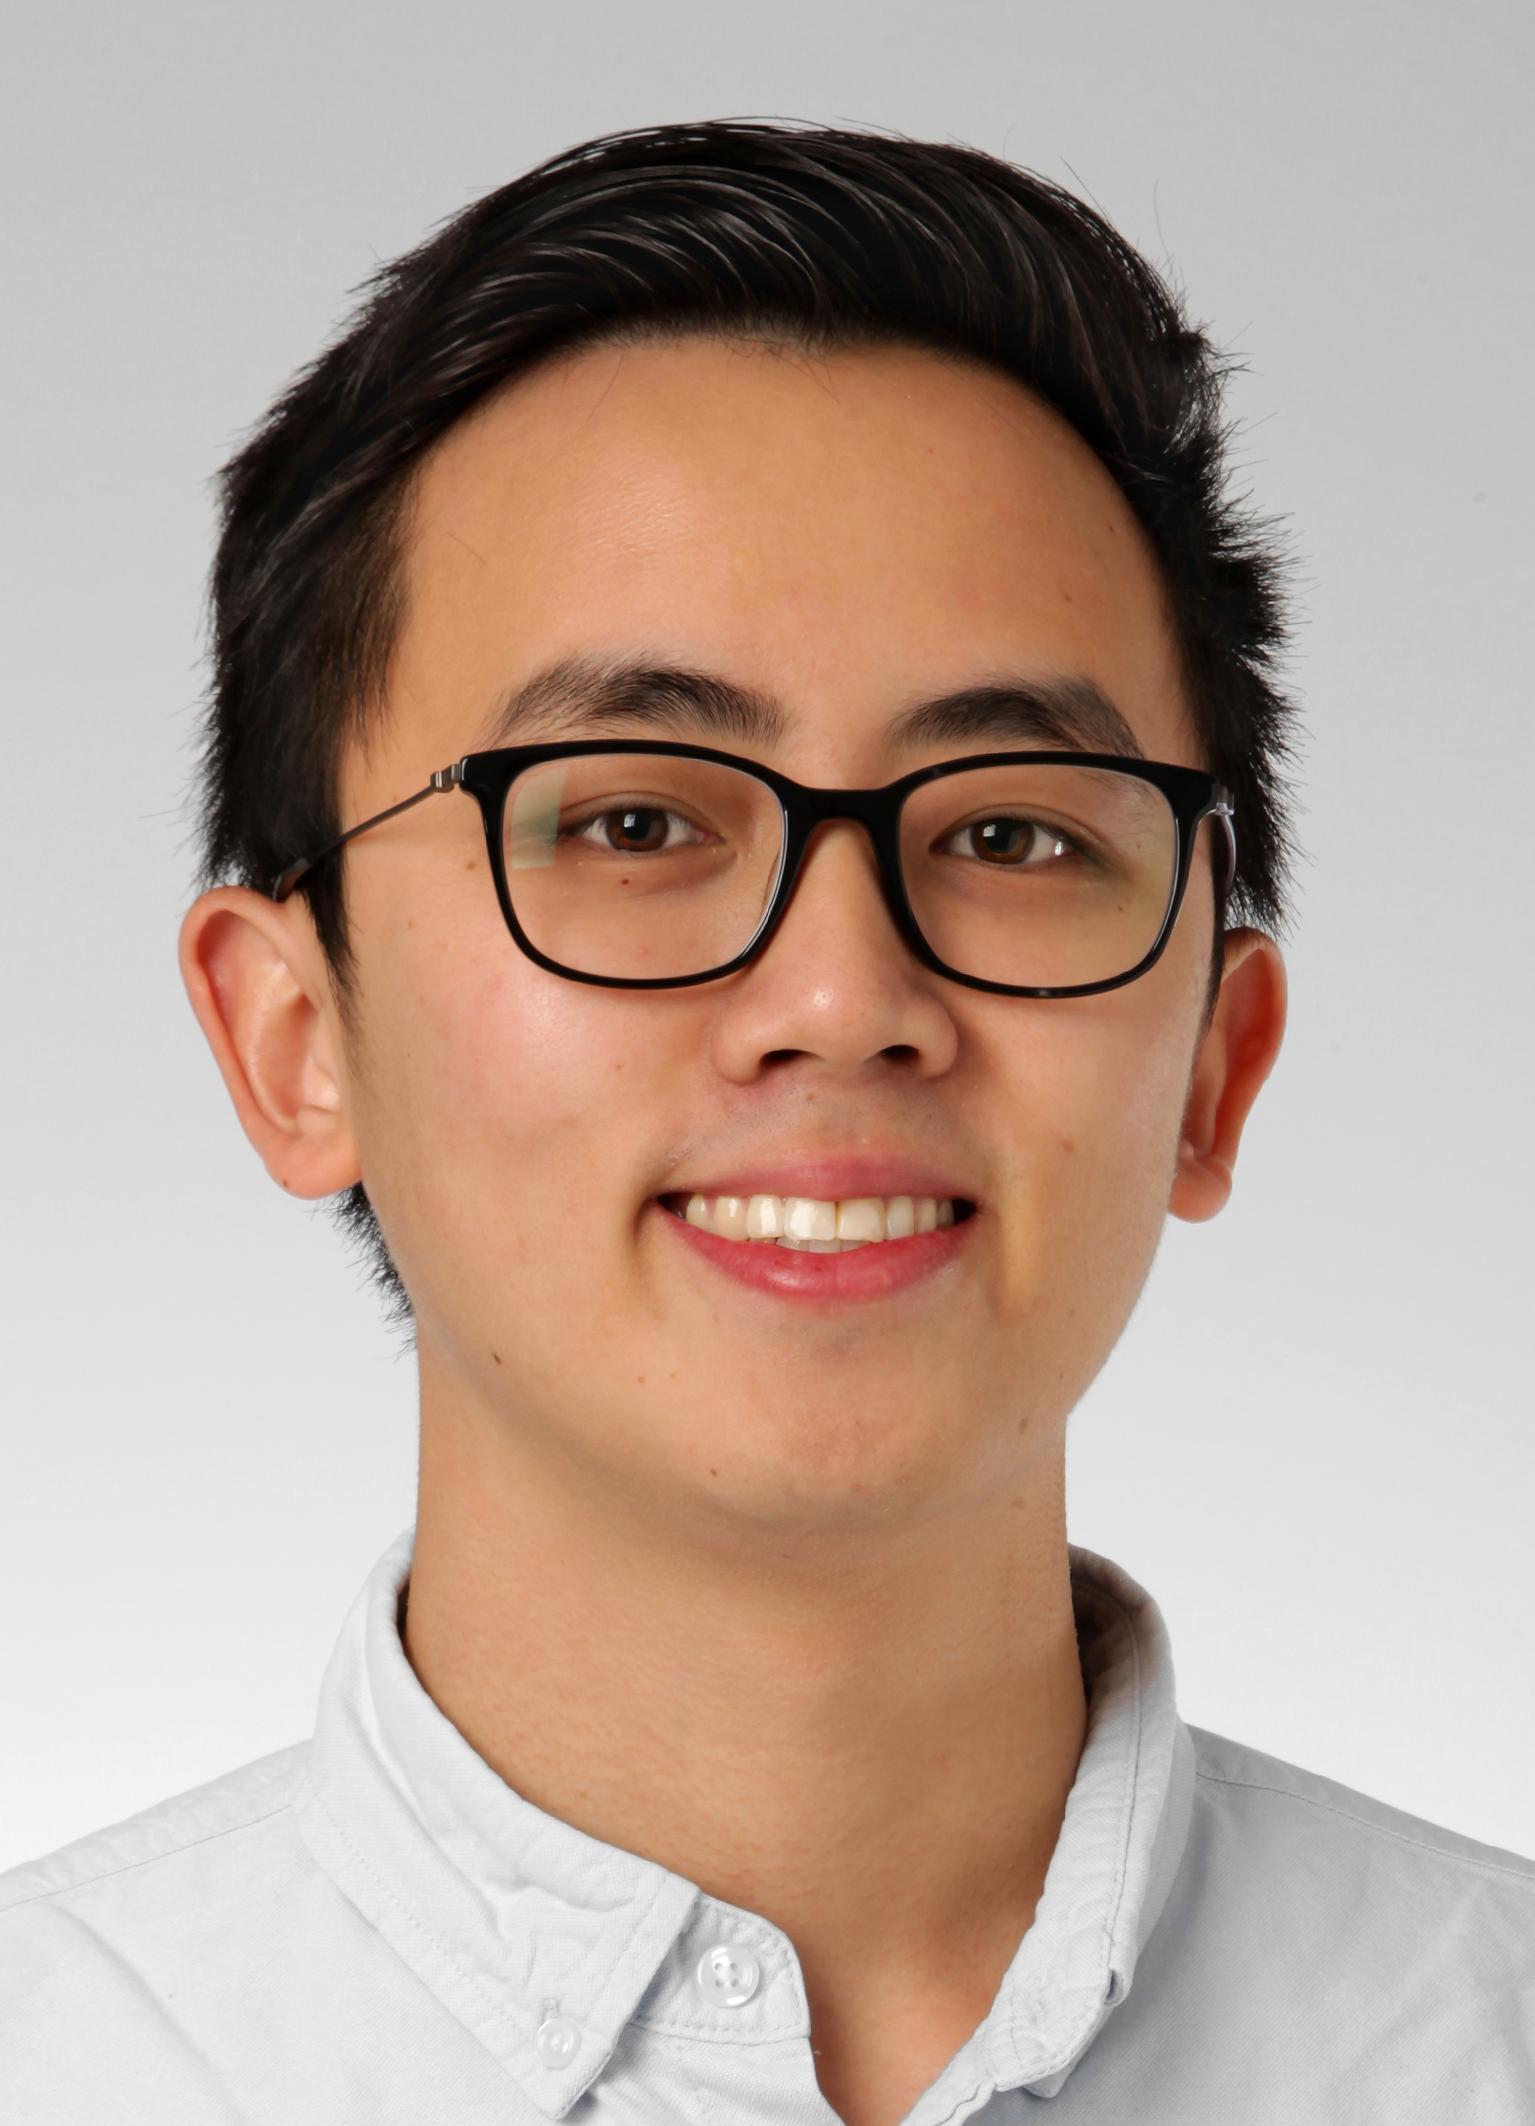 Kevin Yuen | Stagiair | Verder Fiscaal Specialisten en Accountants